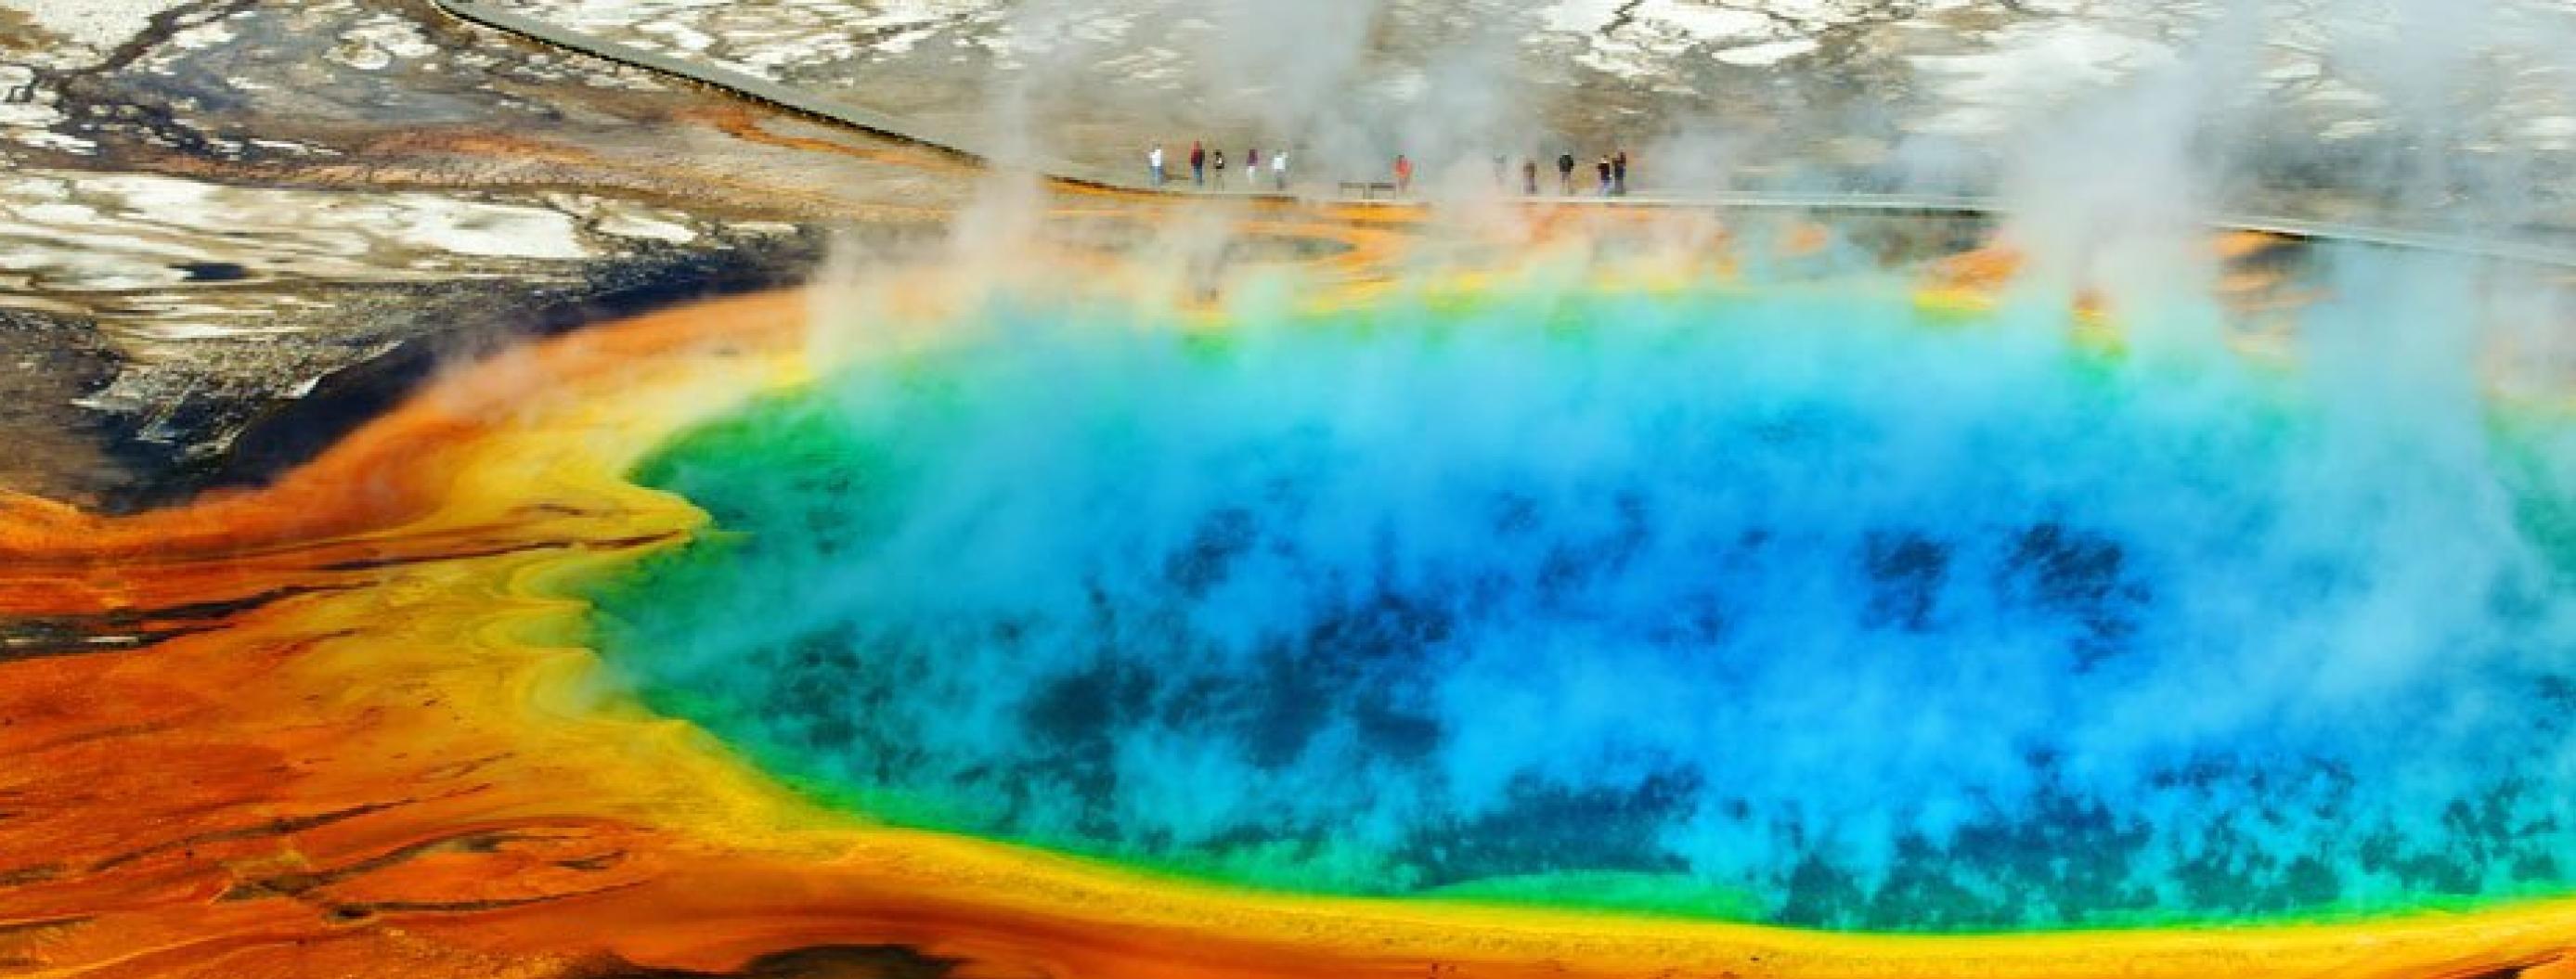 NASA's $3.5 Billion Idea Could Save the Earth from a Supervolcano Apocalypse